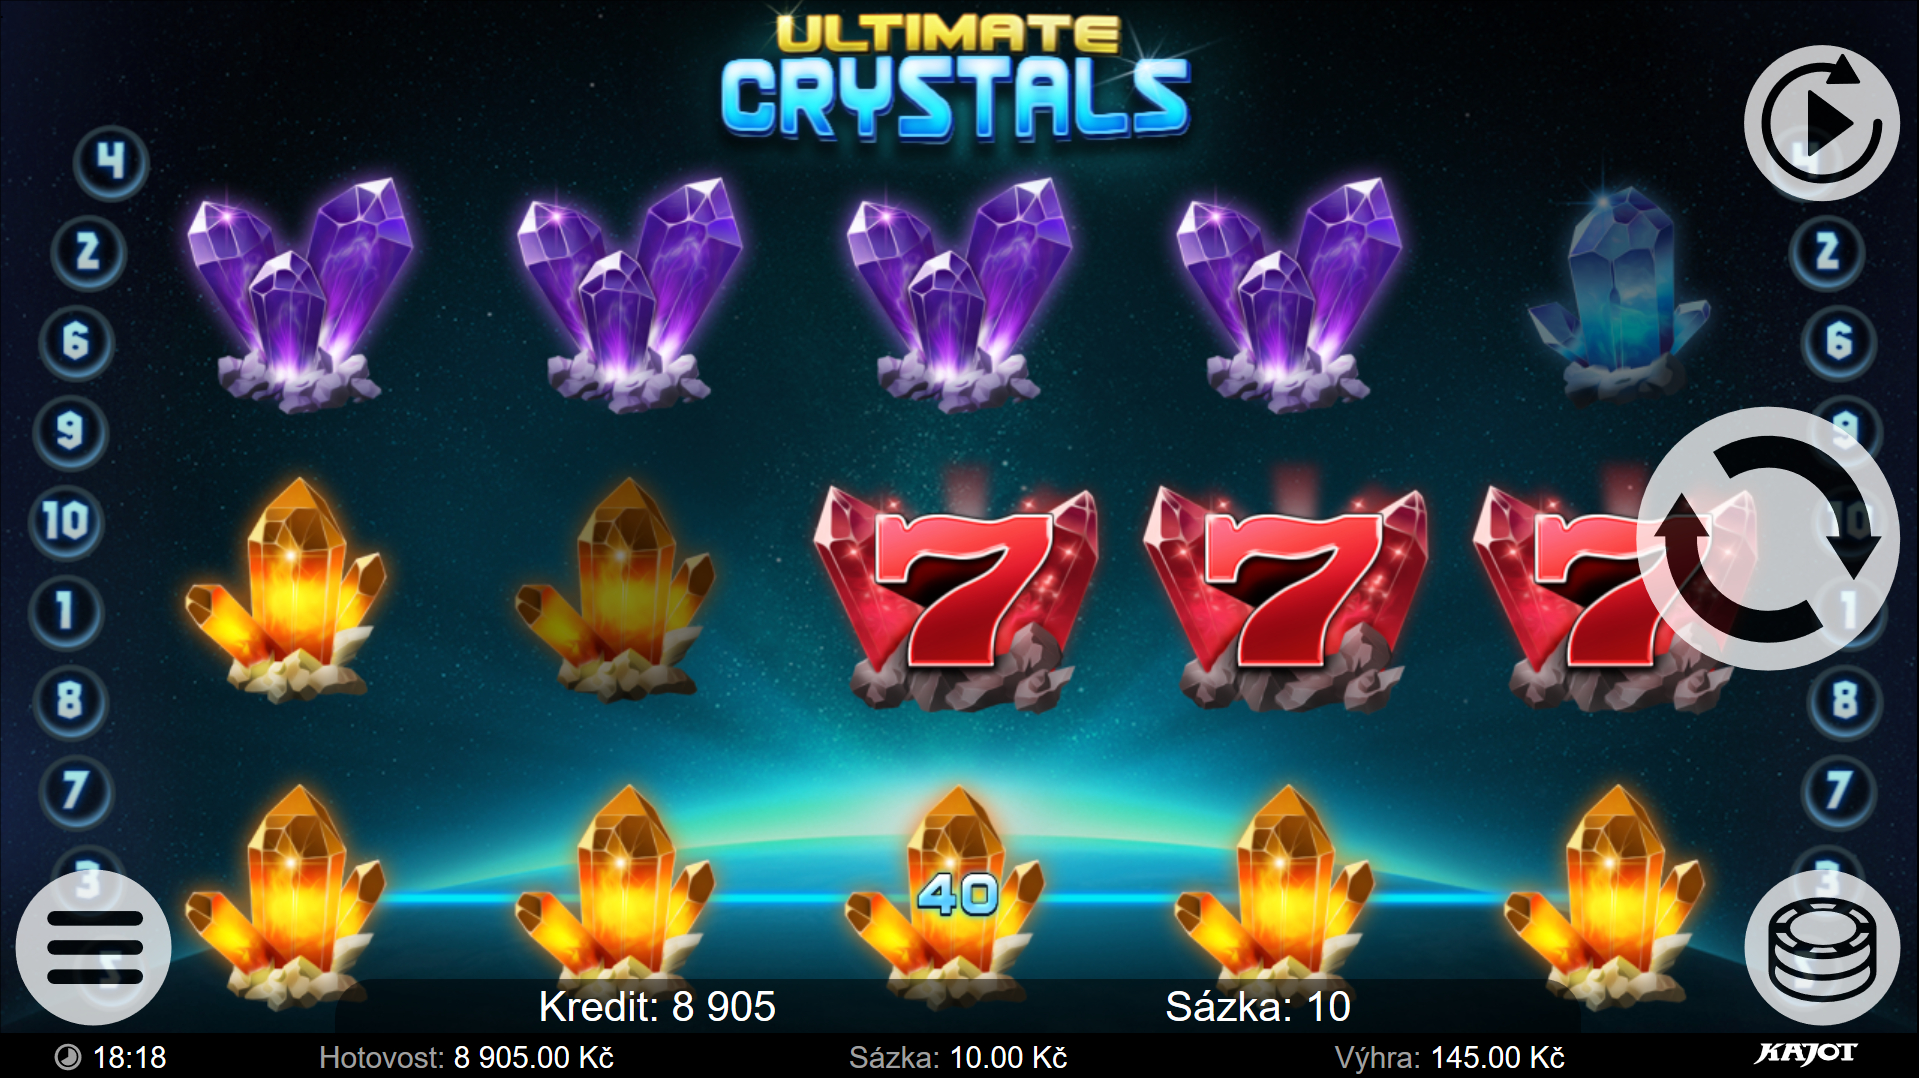 Ultimate Cristals